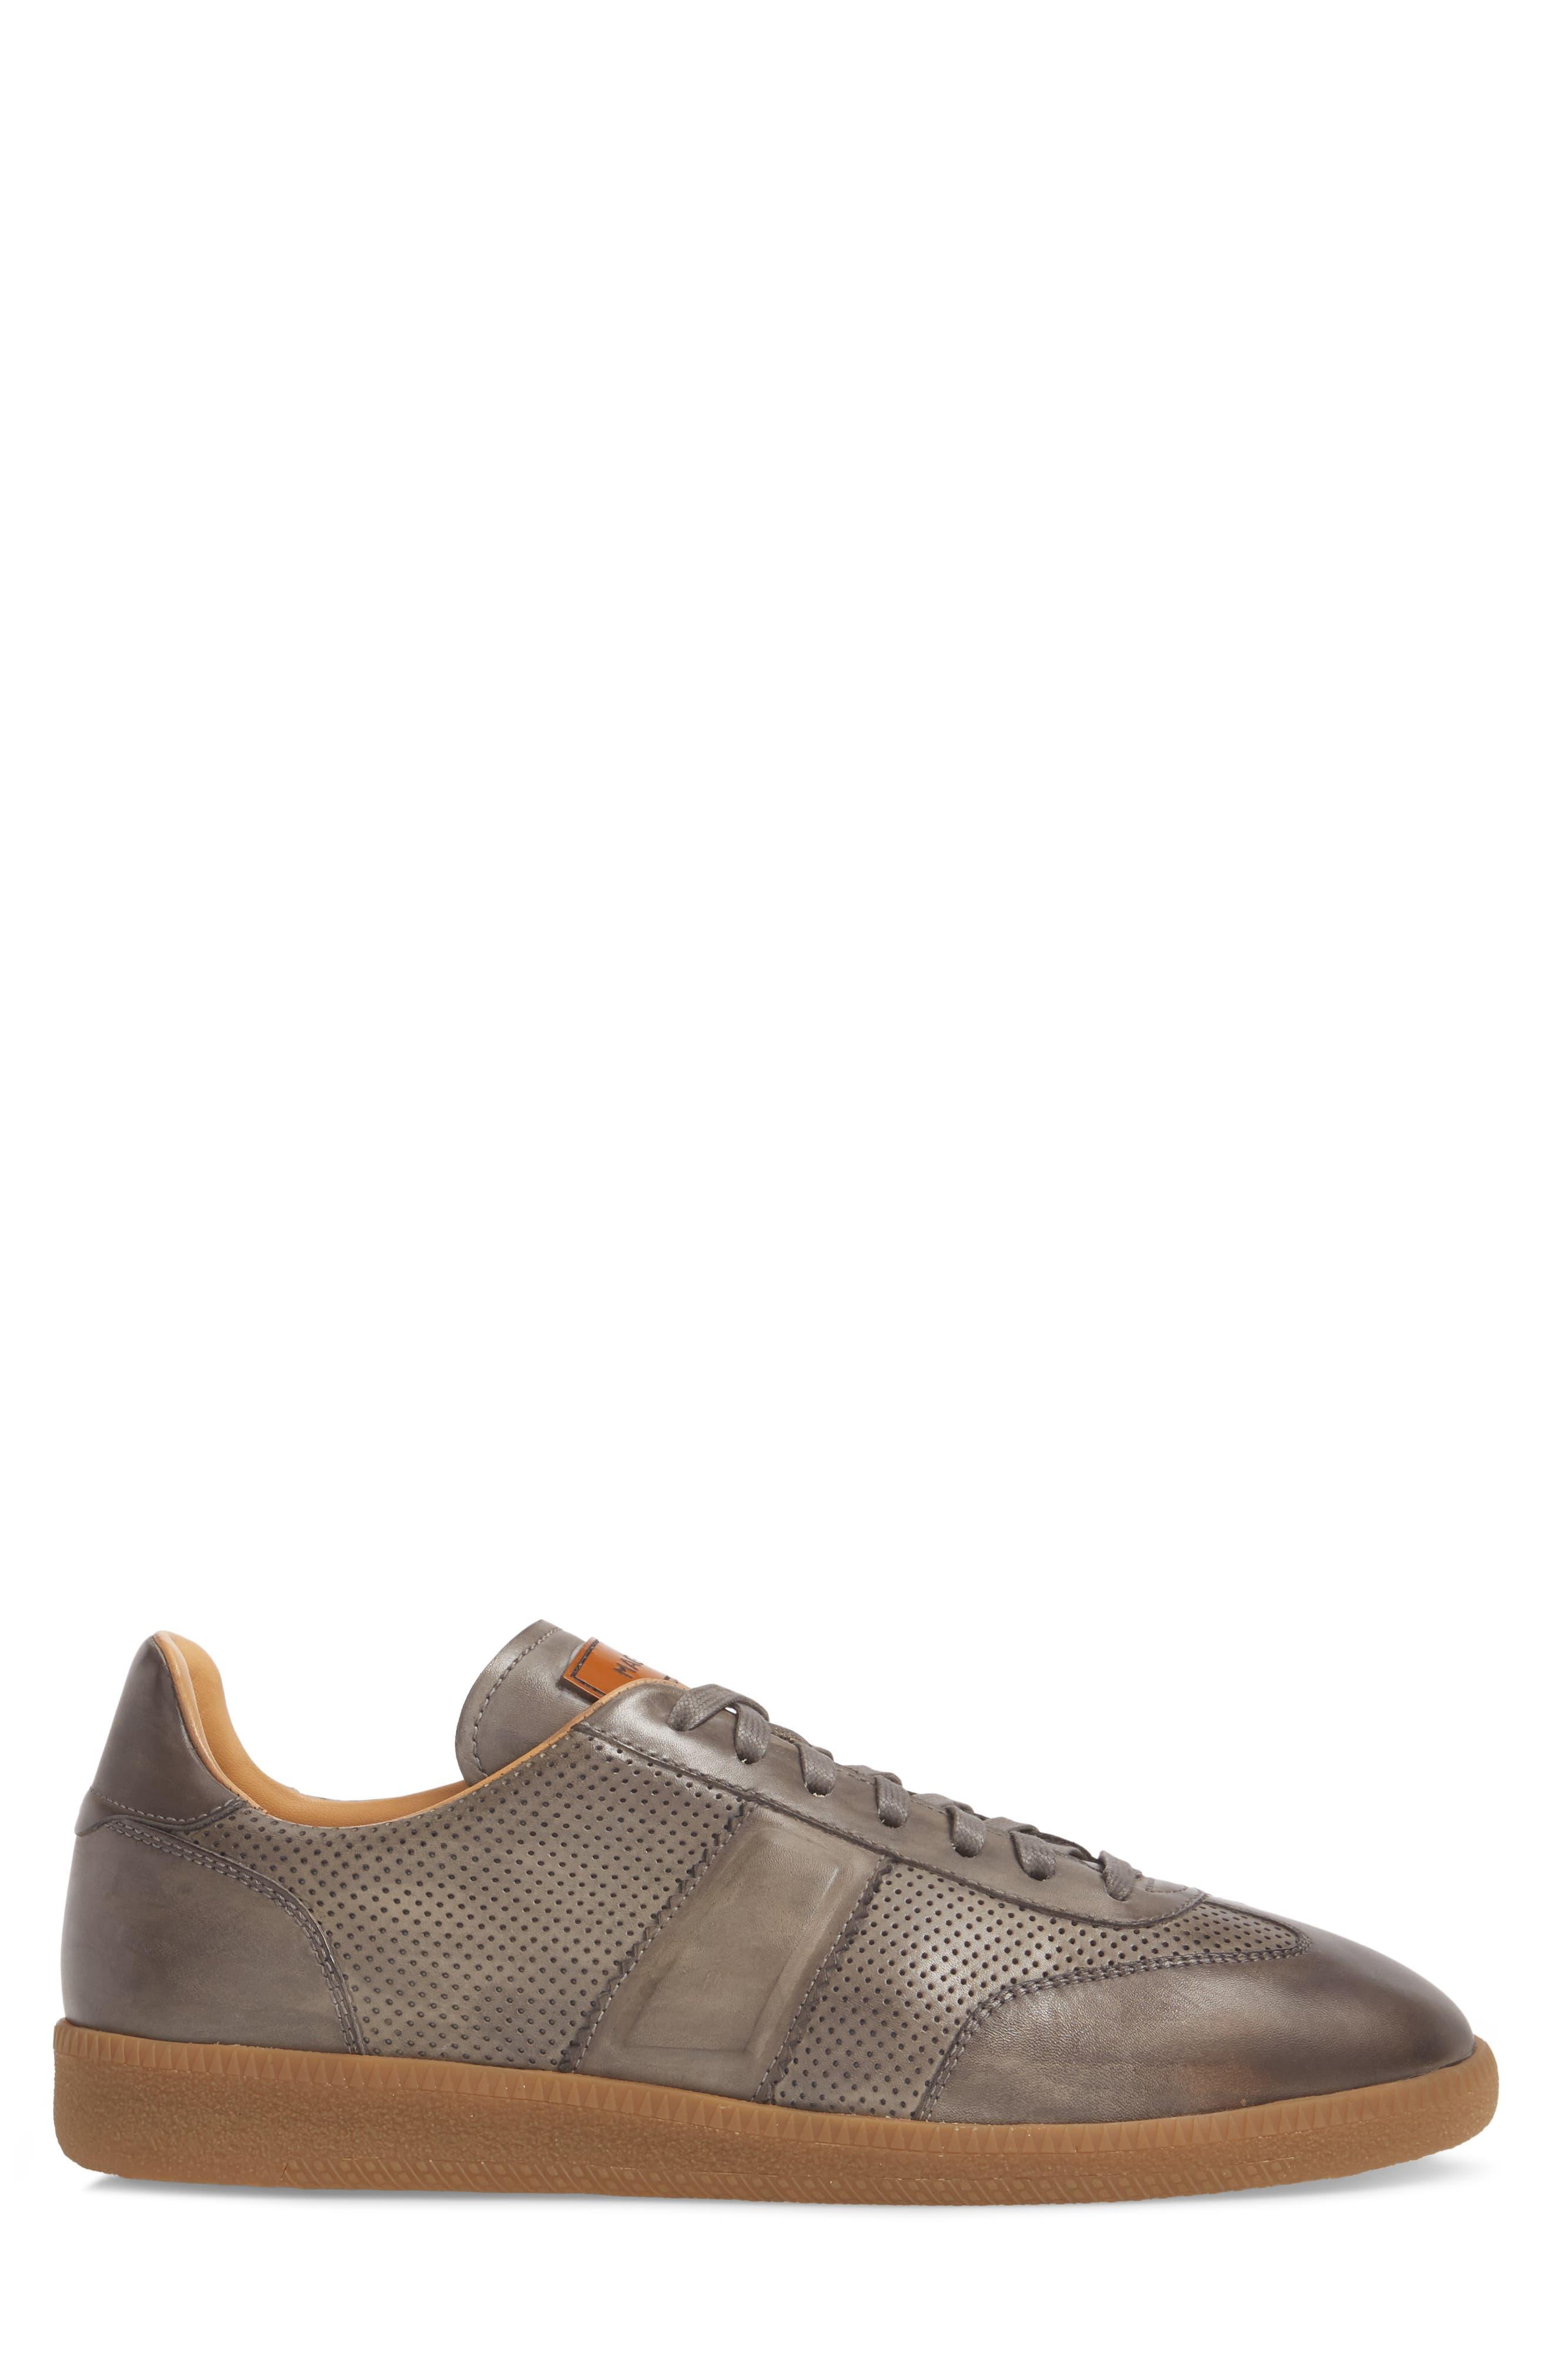 Xavi Embossed Low Top Sneaker,                             Alternate thumbnail 3, color,                             Grey/ Grey Leather